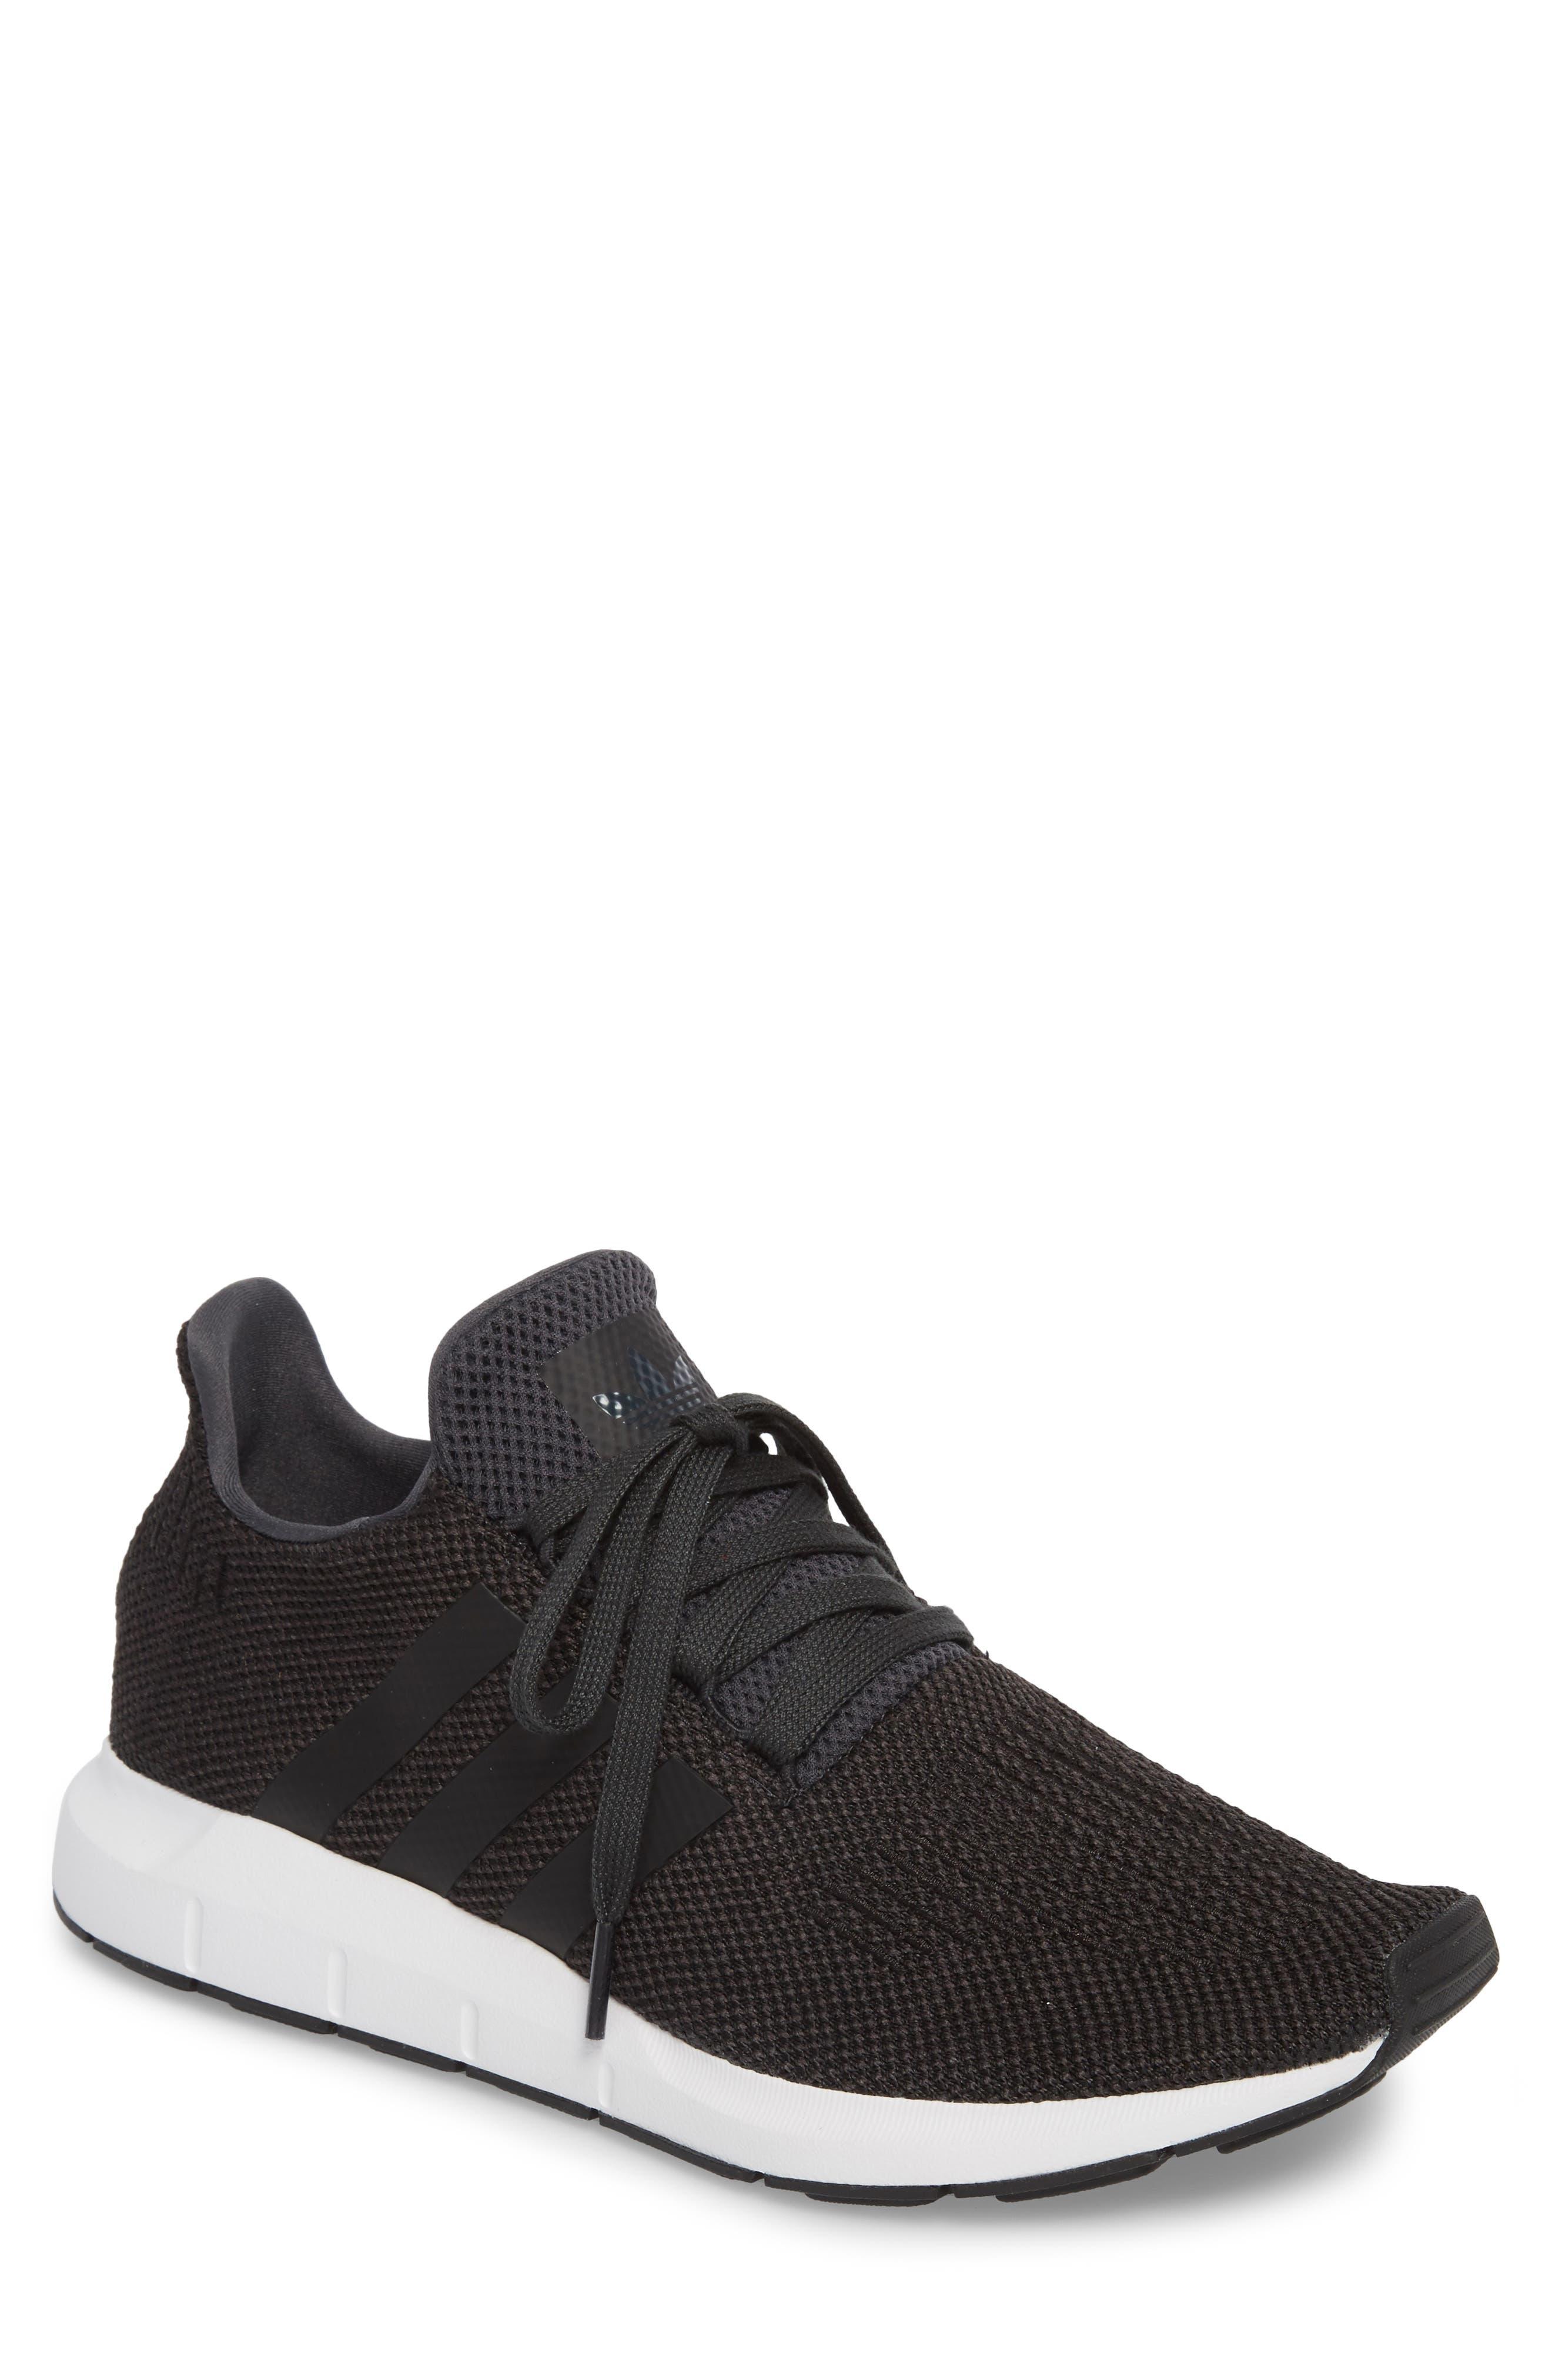 adidas Swift Run Sneaker (Men) | Nordstrom